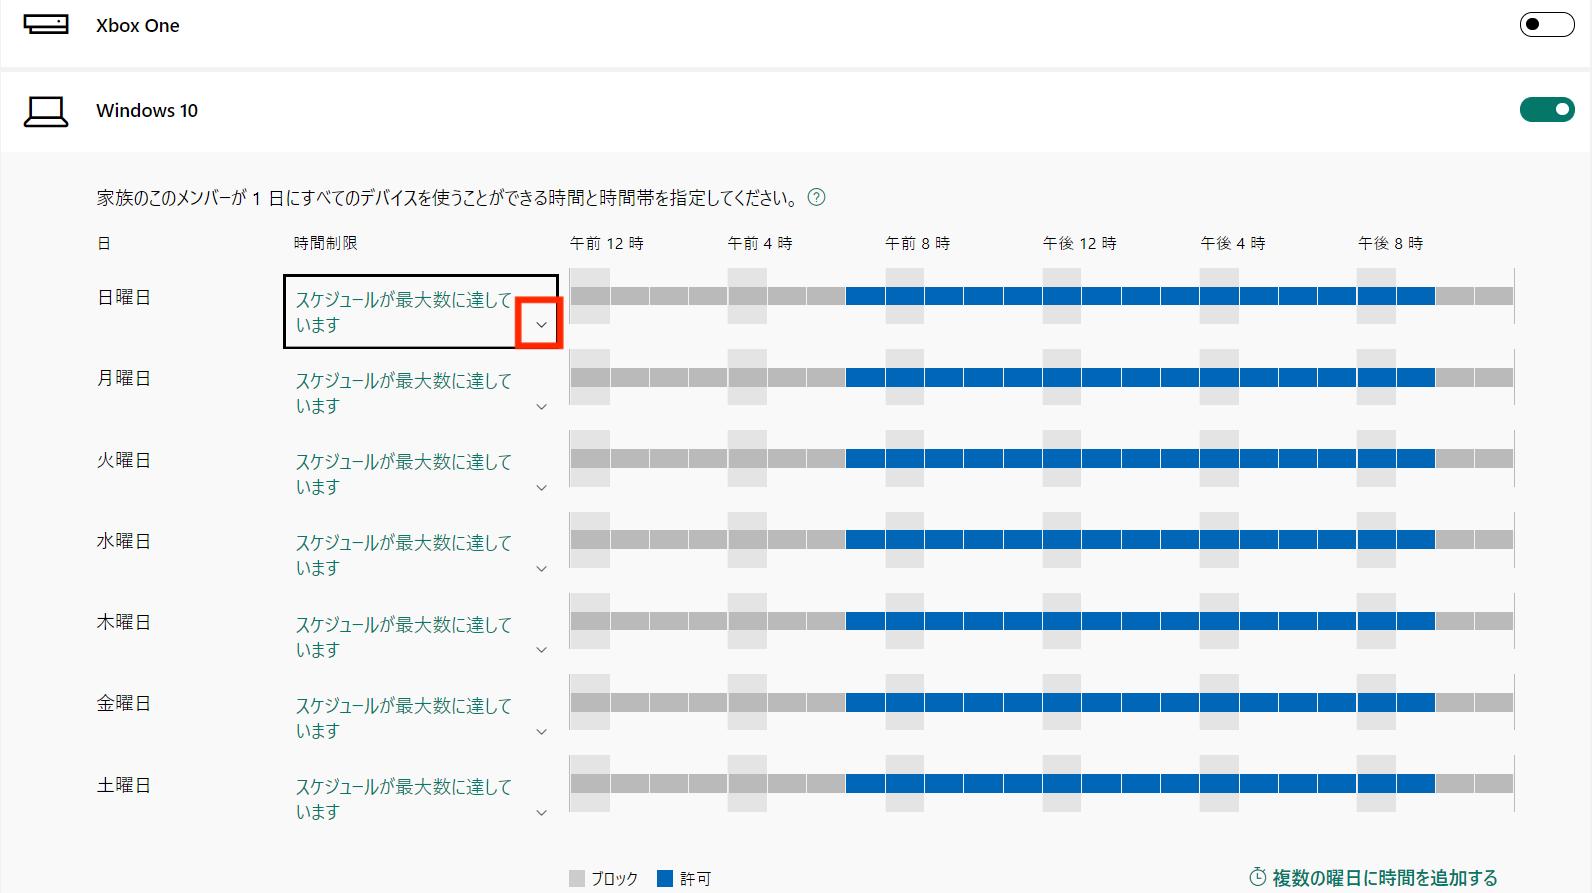 【Windows】ファミリー機能の使い方6